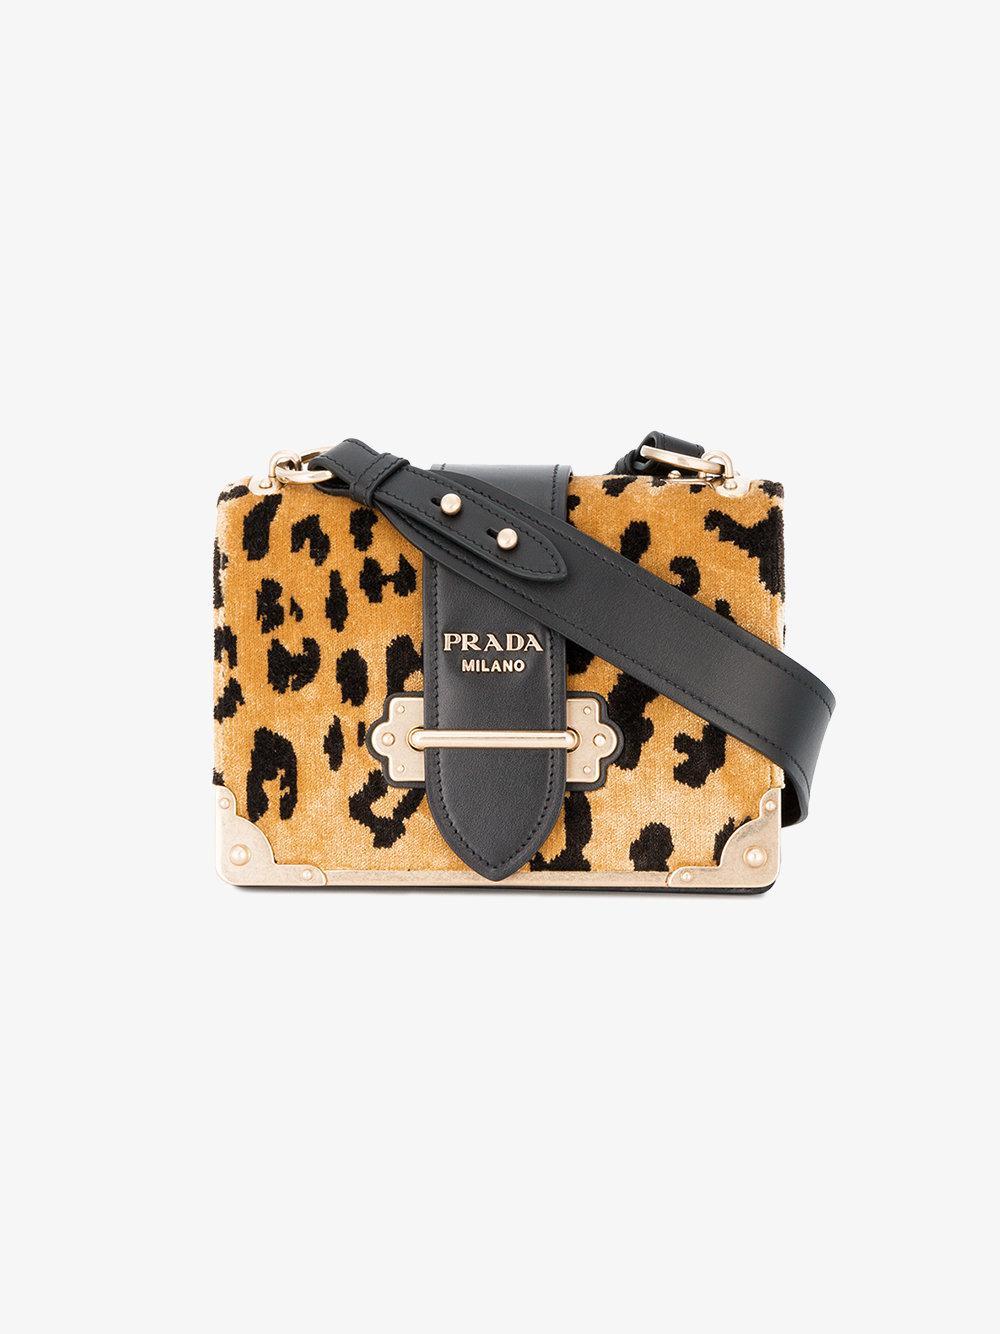 796a5a9c6f2 ... order lyst prada leopard cahier small velvet shoulder bag in red 84eea  58c5e